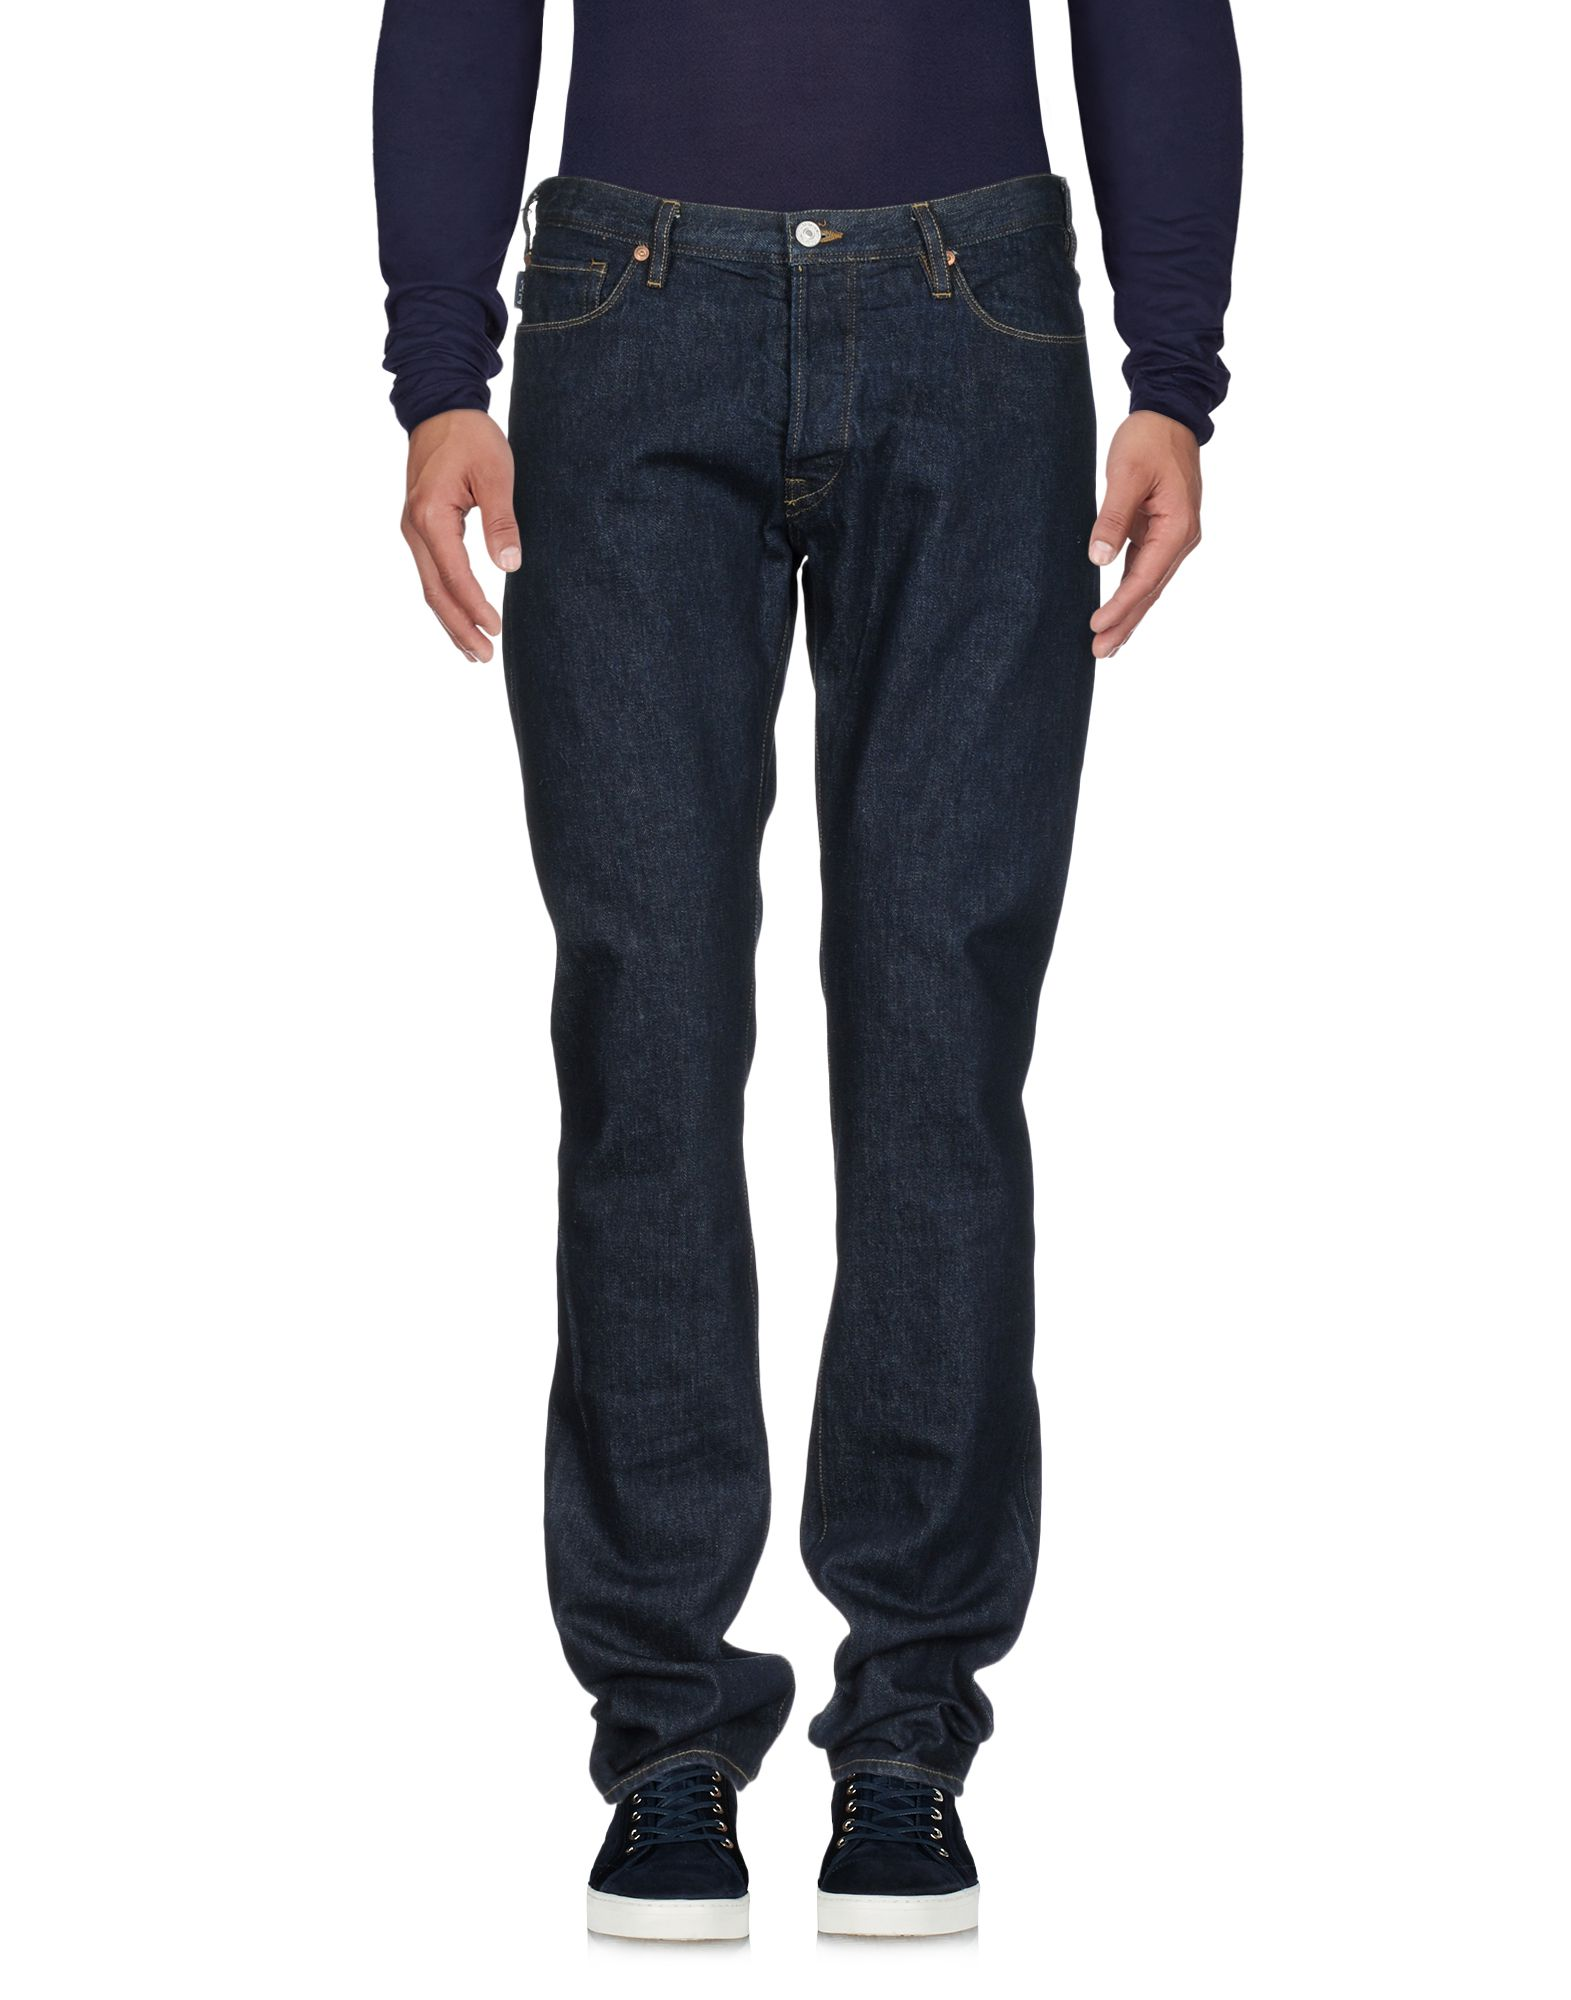 Pantaloni Jeans Paul Smith Donna - Acquista online su